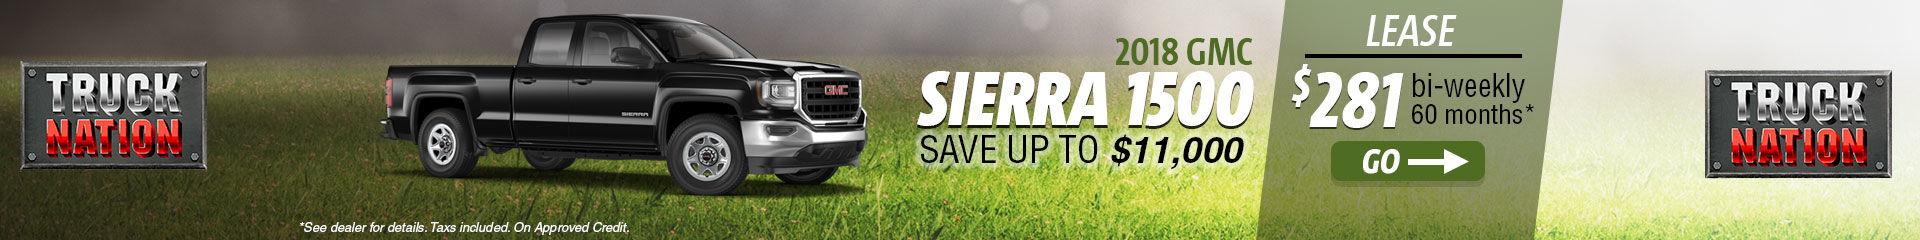 Lease the 2018 GMC Sierra 1500